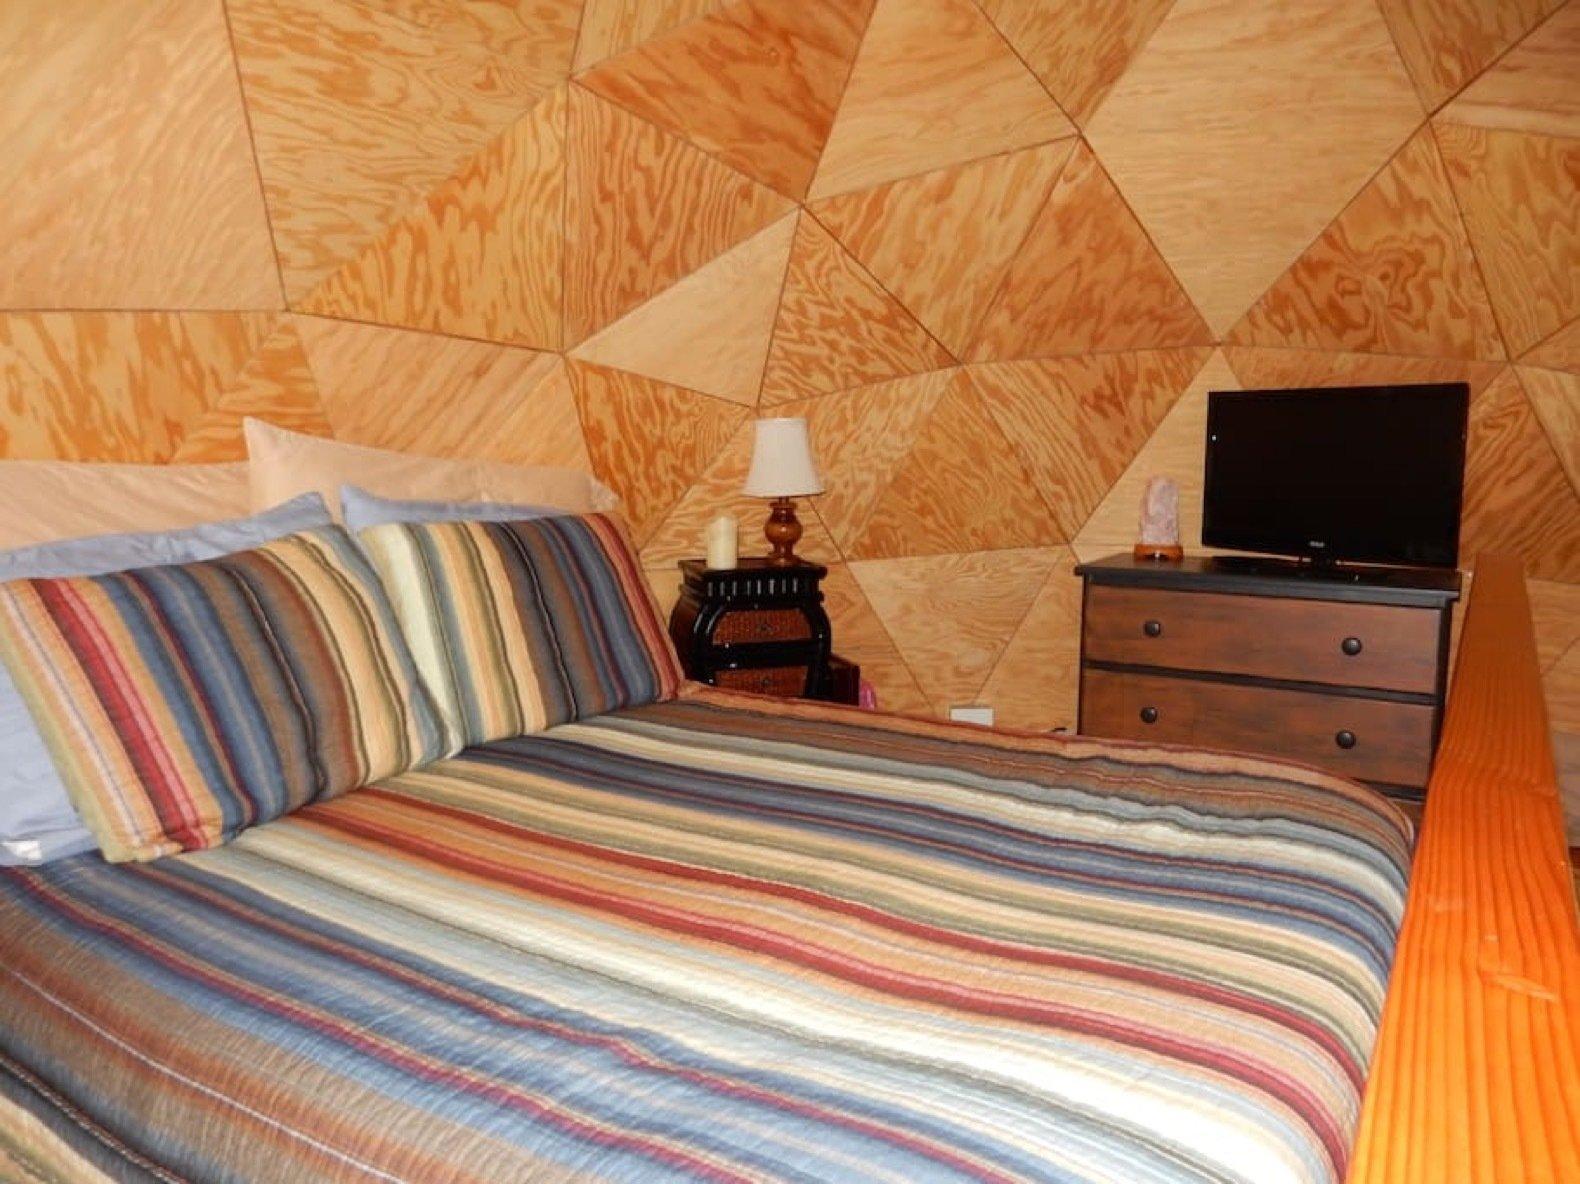 Mushroom Dome Cabin bedroom